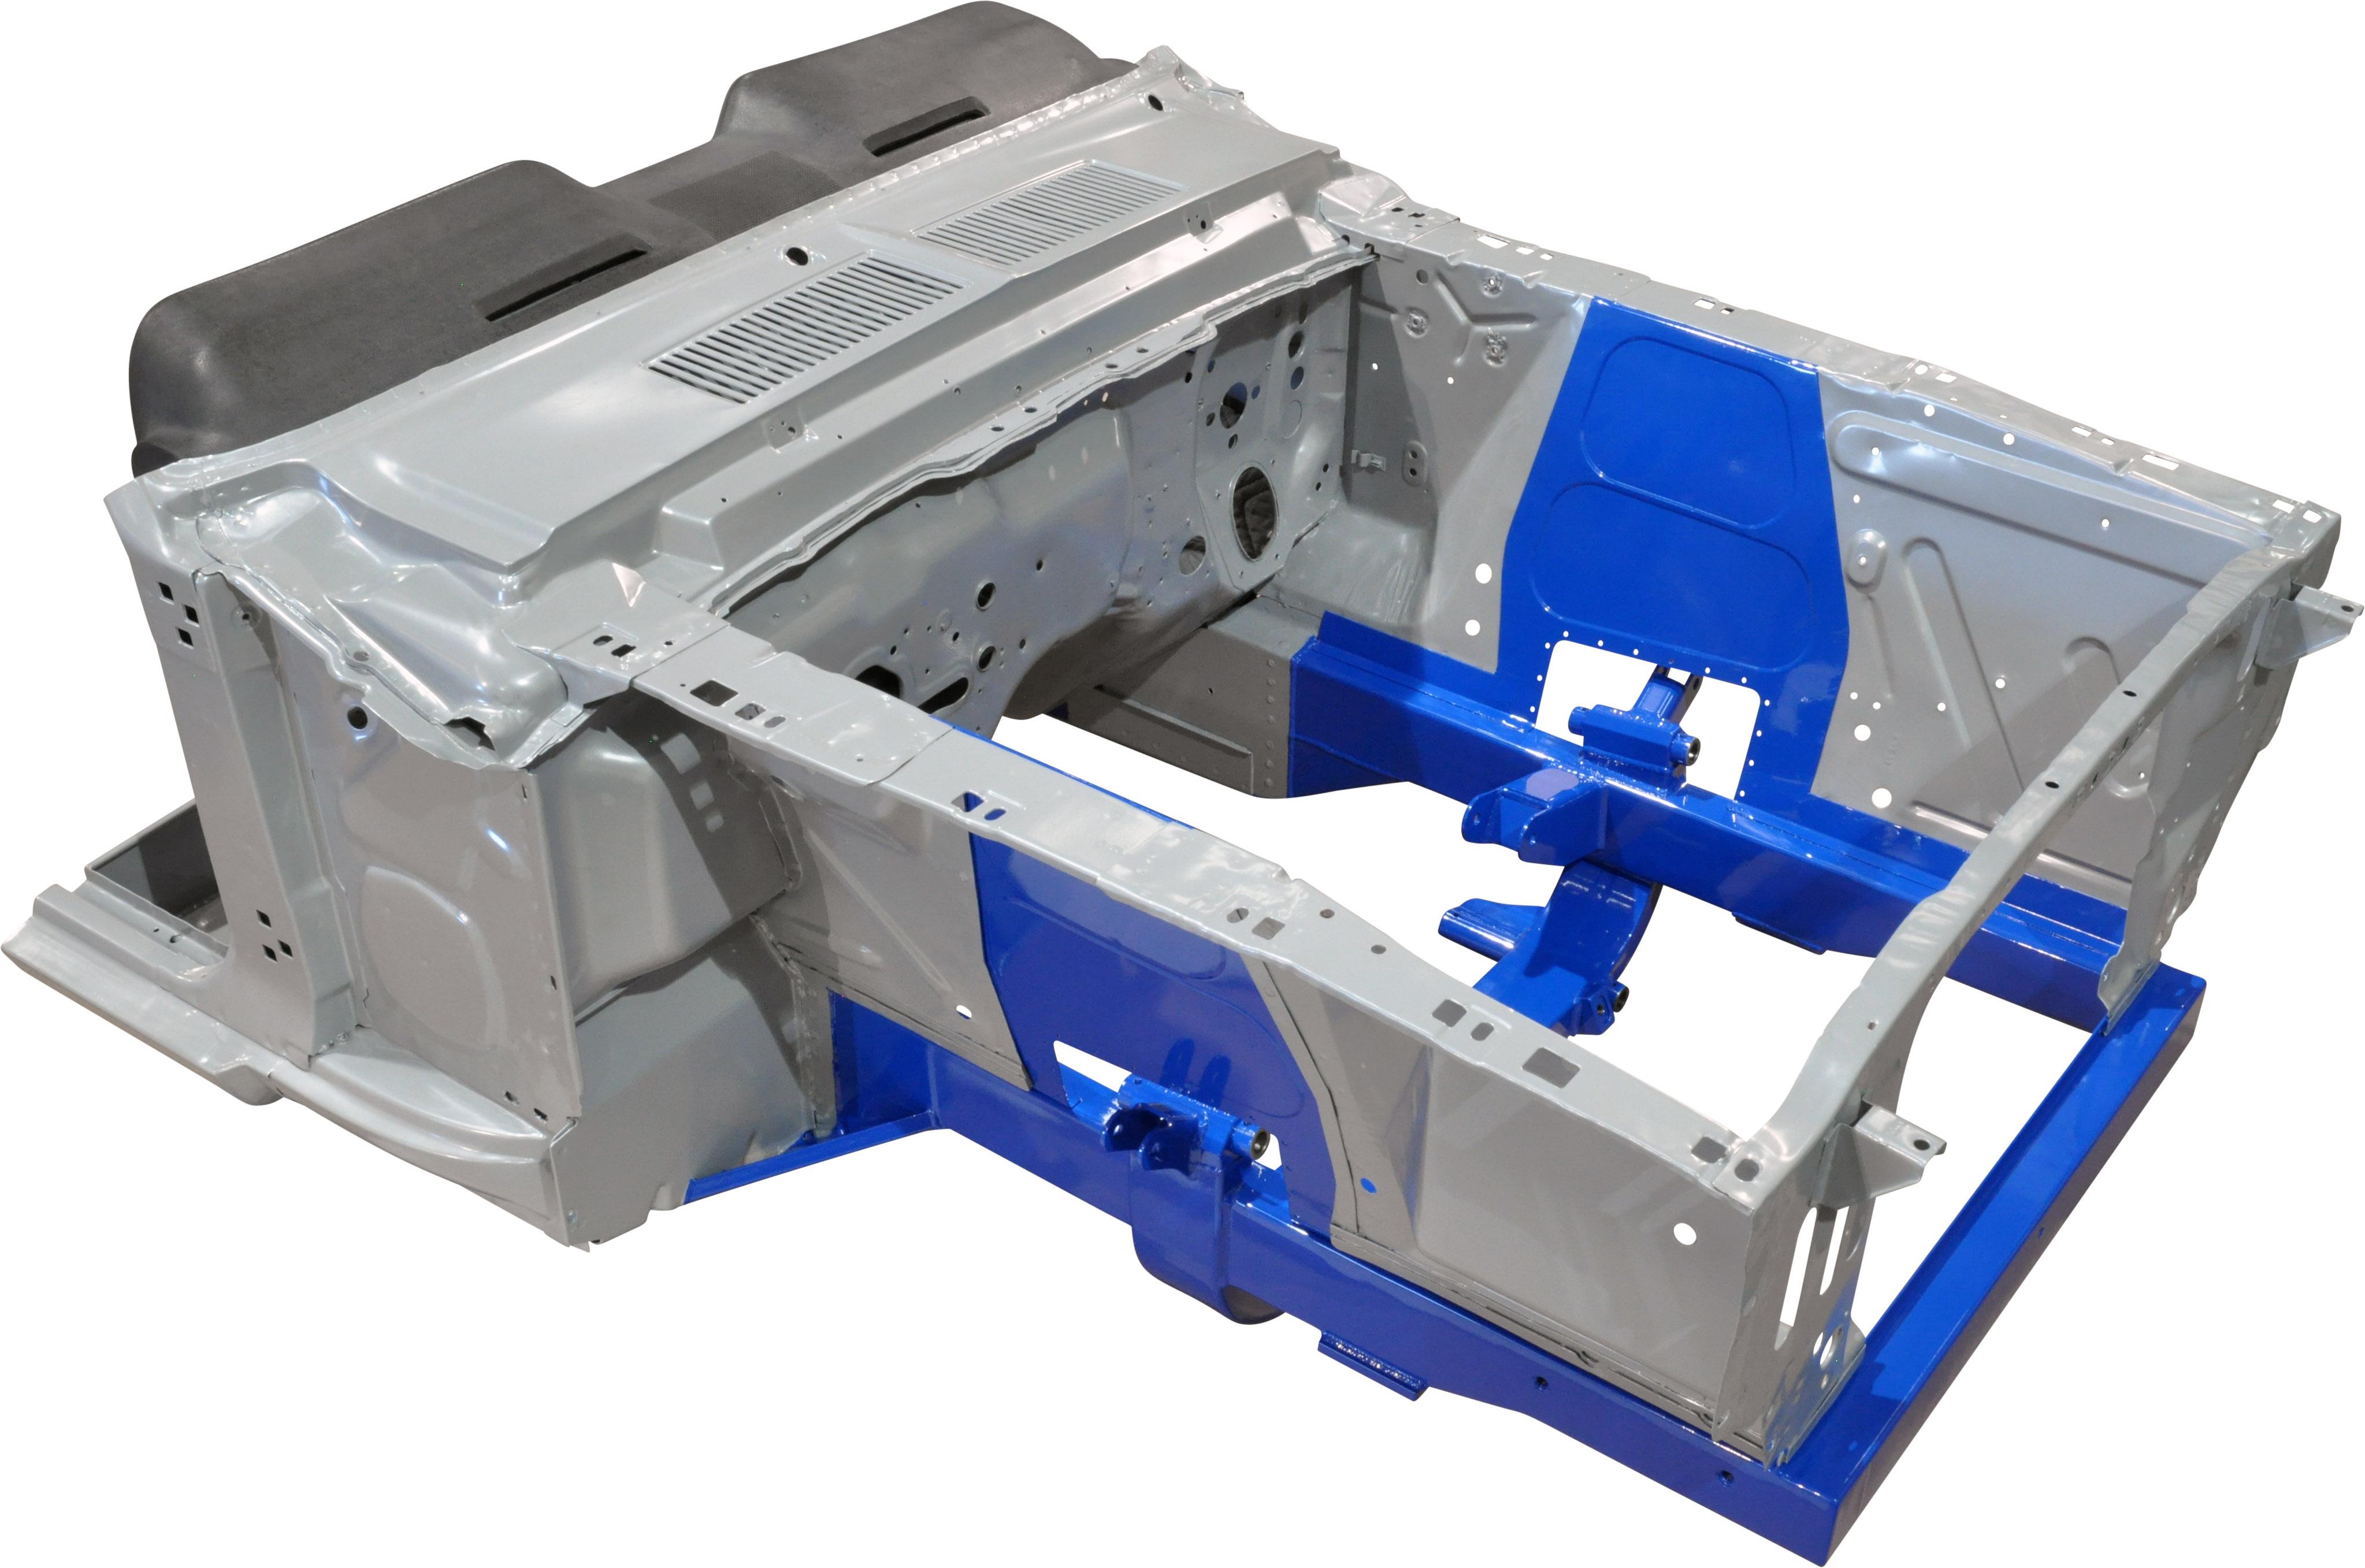 chris alston u0026 39 s chassisworks